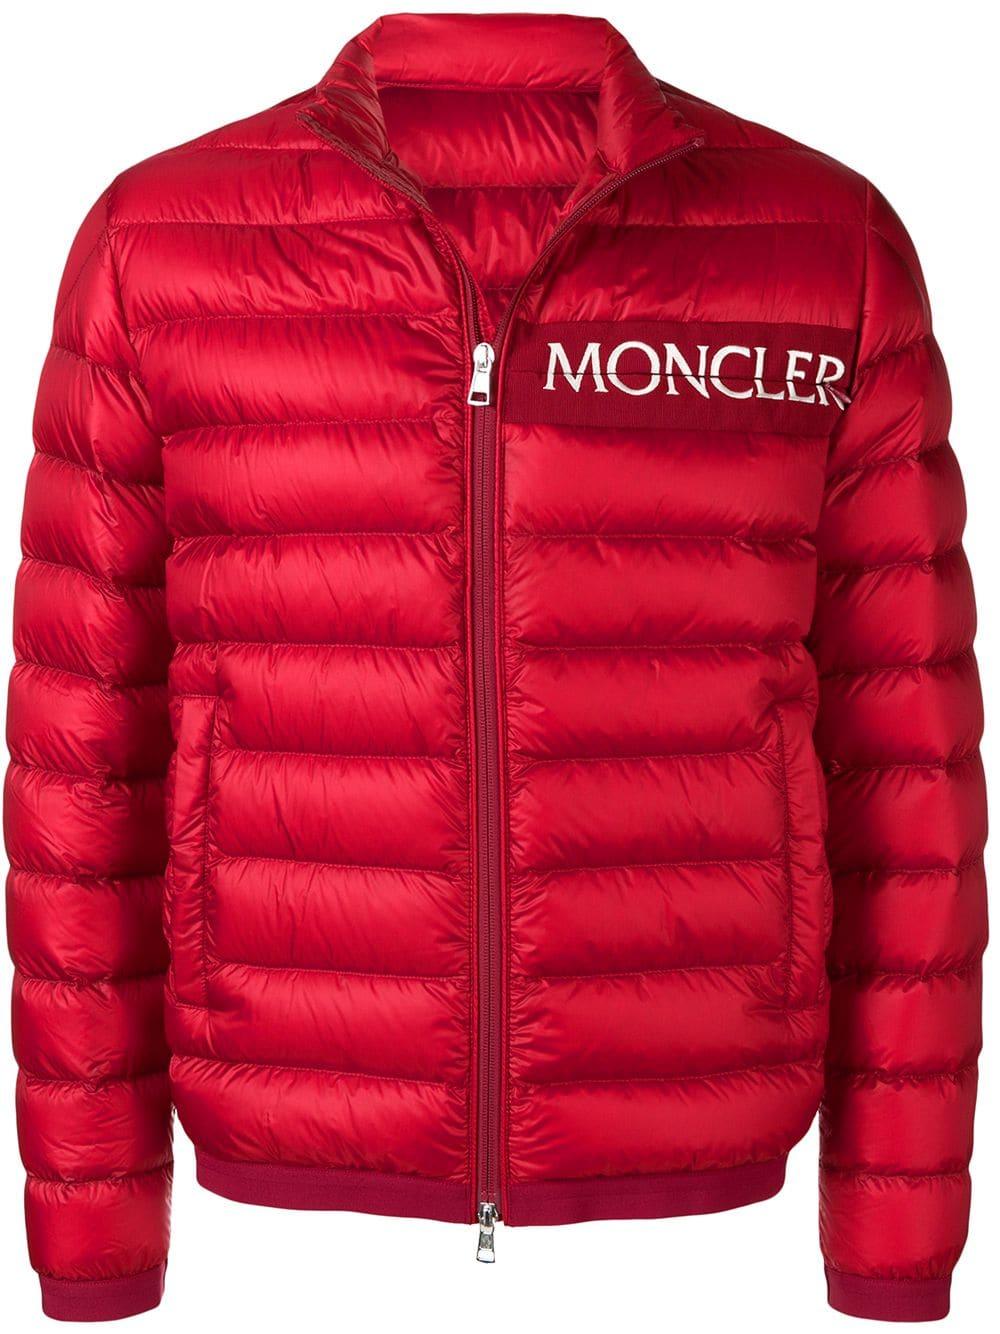 Moncler Moncler Logo Padded Jacket Red Moncler Cloth Moncler Jacket Jackets Padded Jacket [ 1334 x 1000 Pixel ]